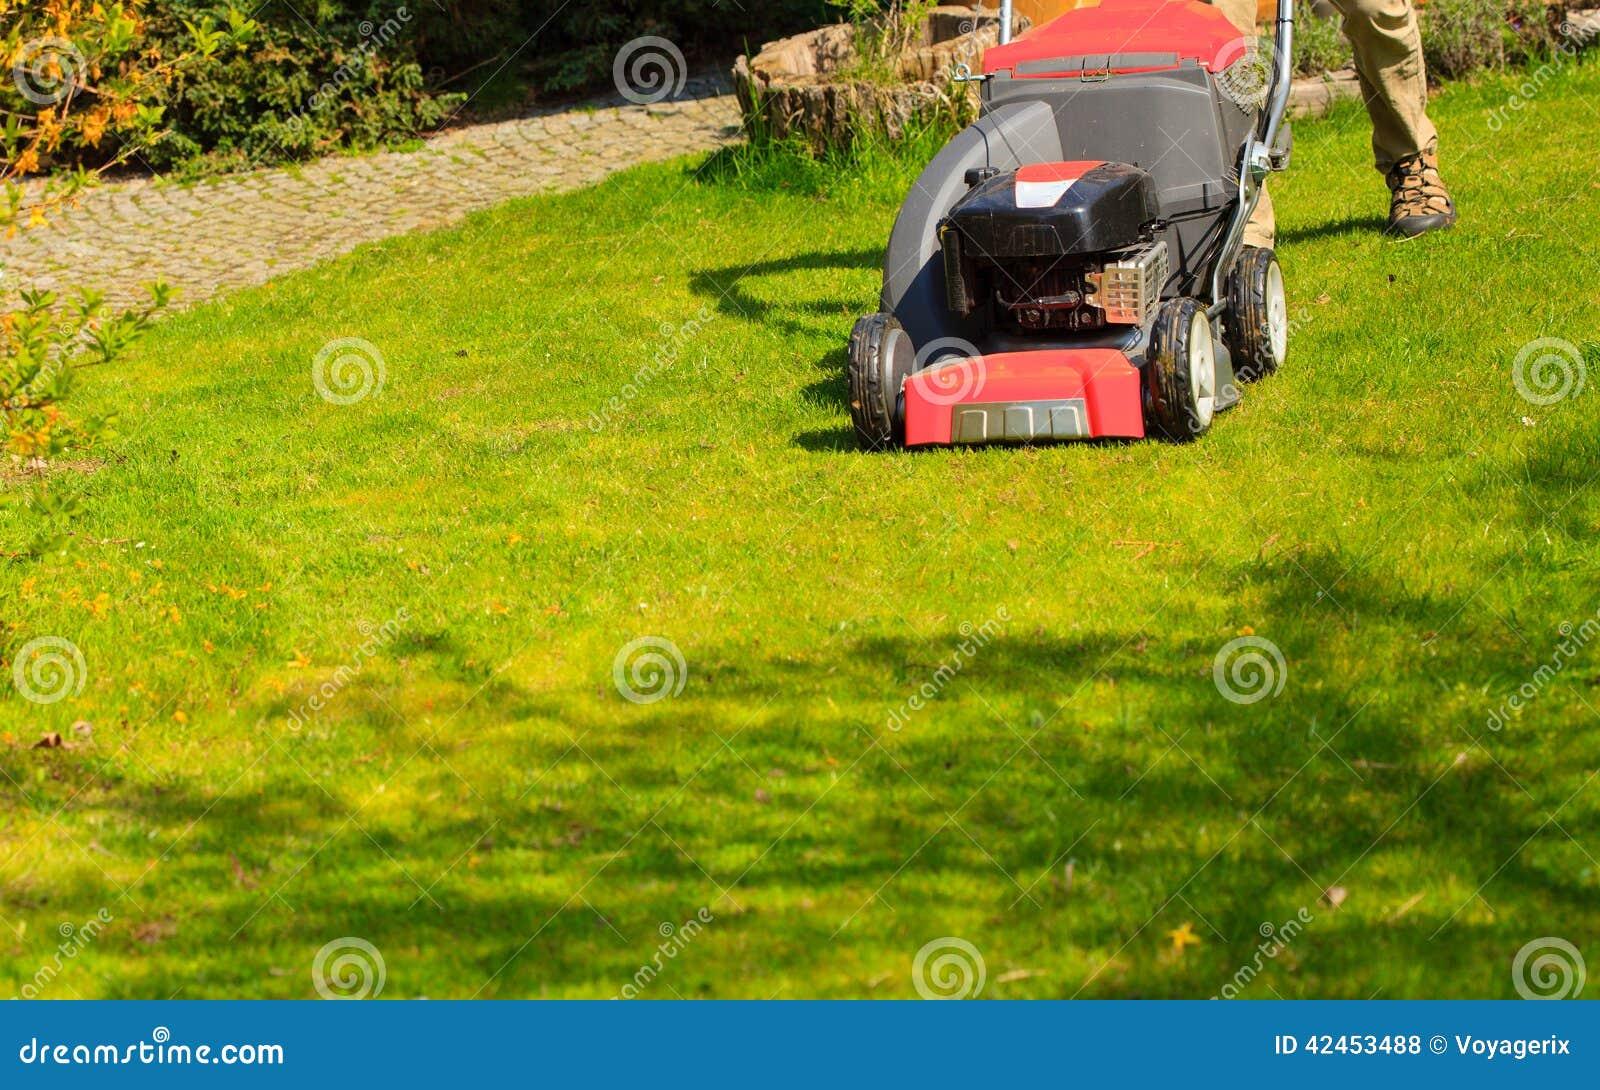 Gardening Mähender grüner Rasen mit rotem Rasenmäher